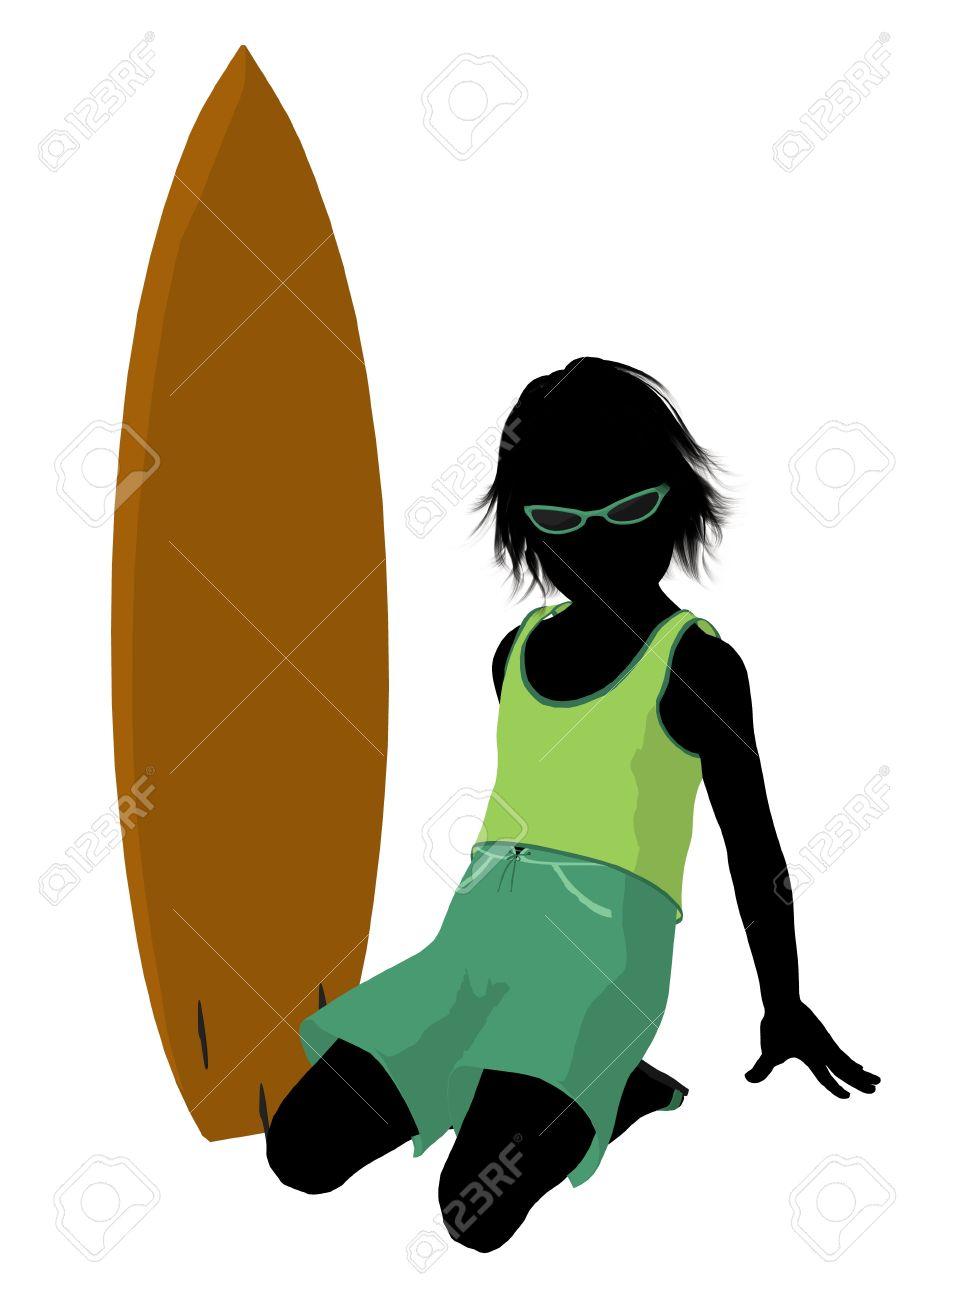 Silhouette boy surfboard clipart graphic Beach Boy With Surfboard Illustration Silhouette On A White ... graphic